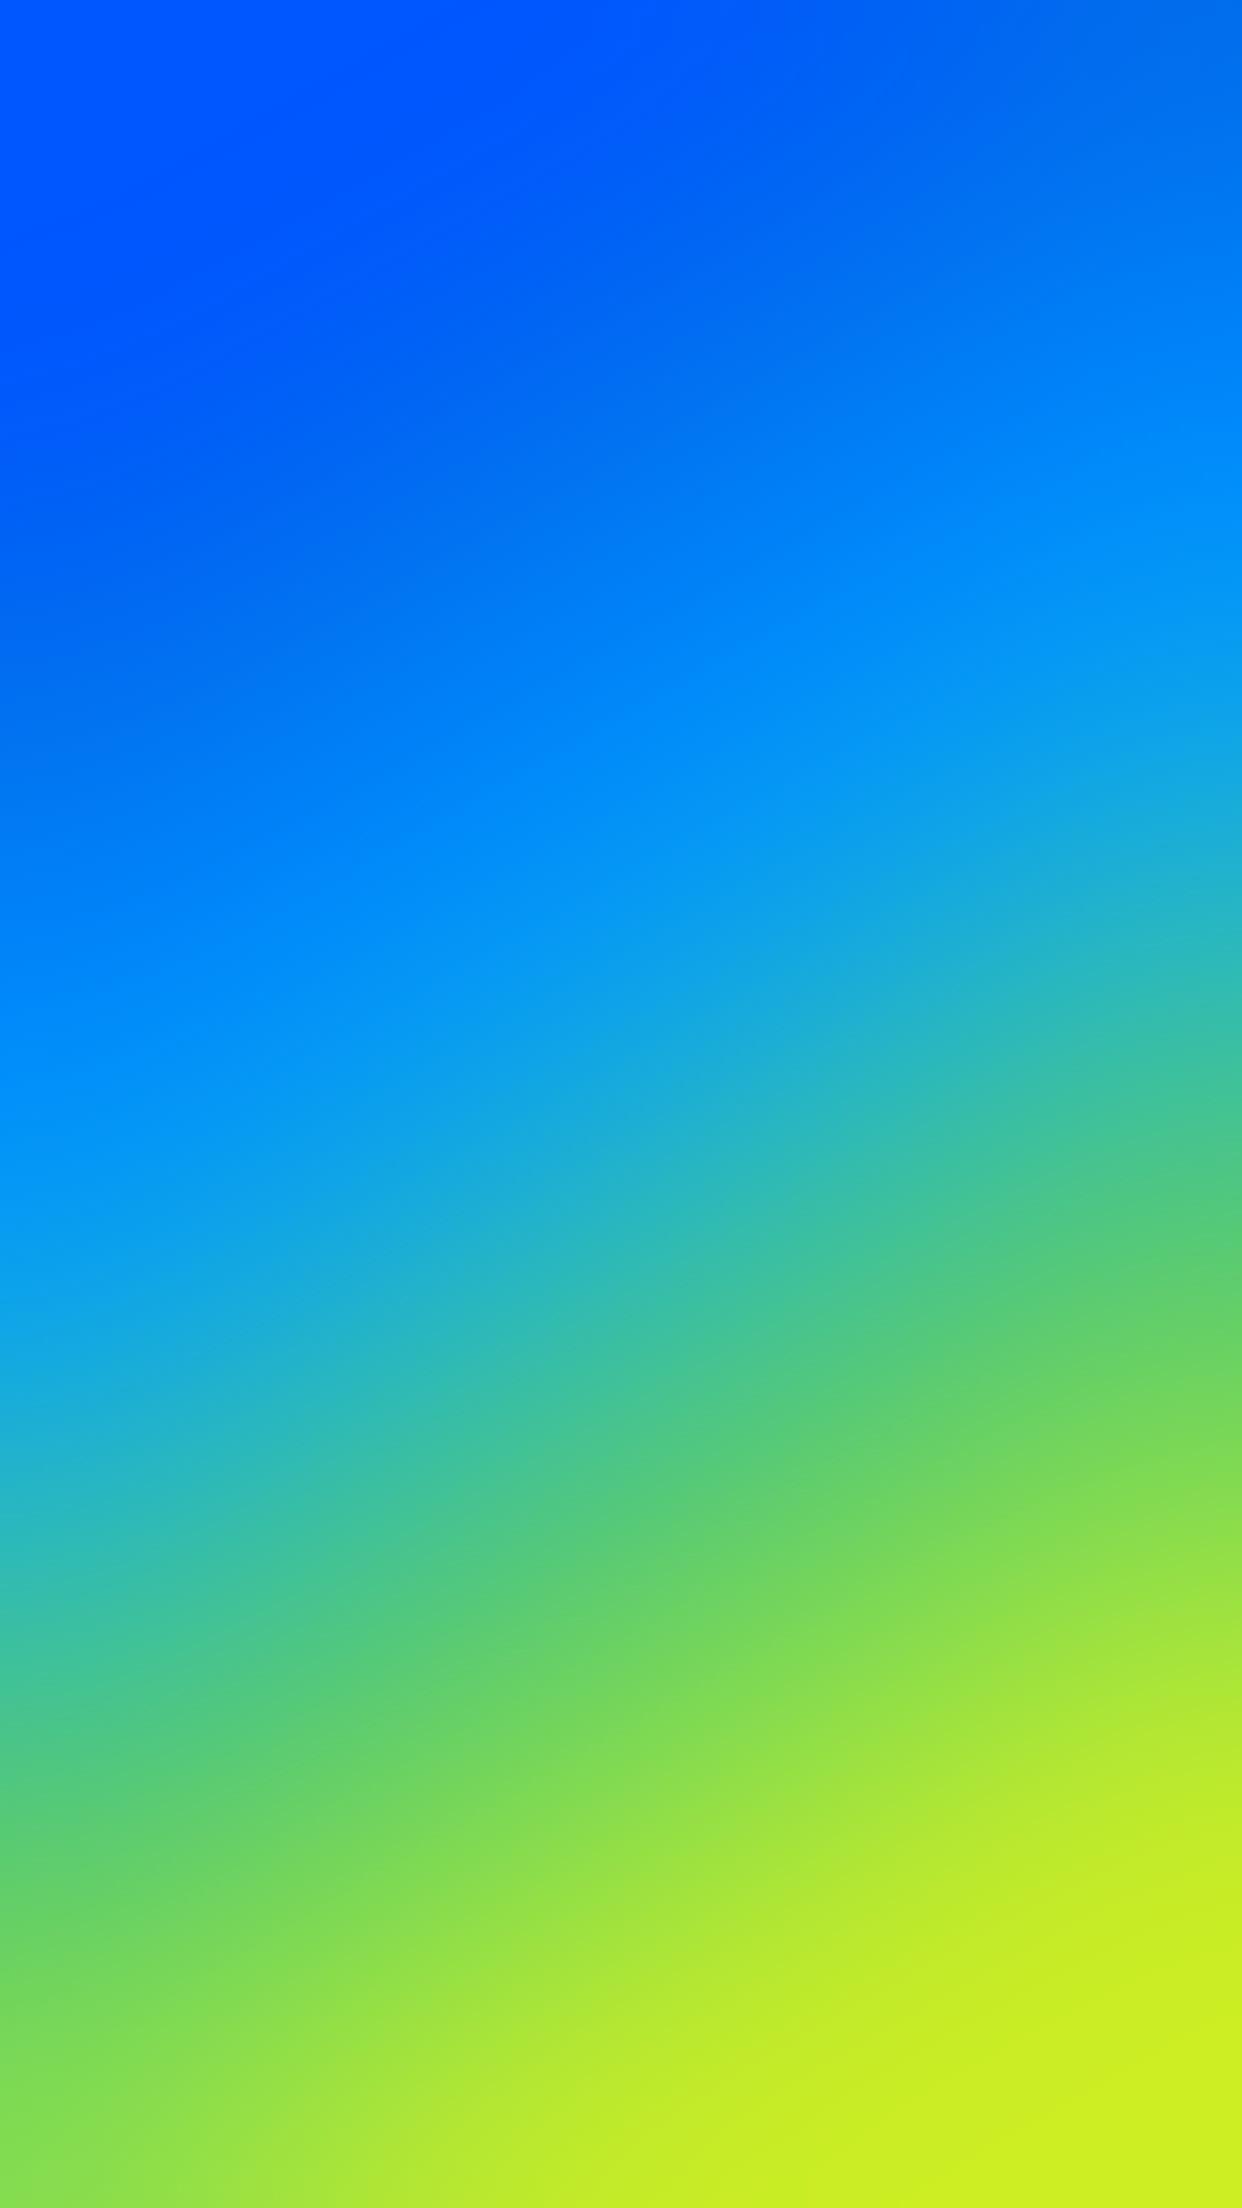 Download: iOS 10 gradient